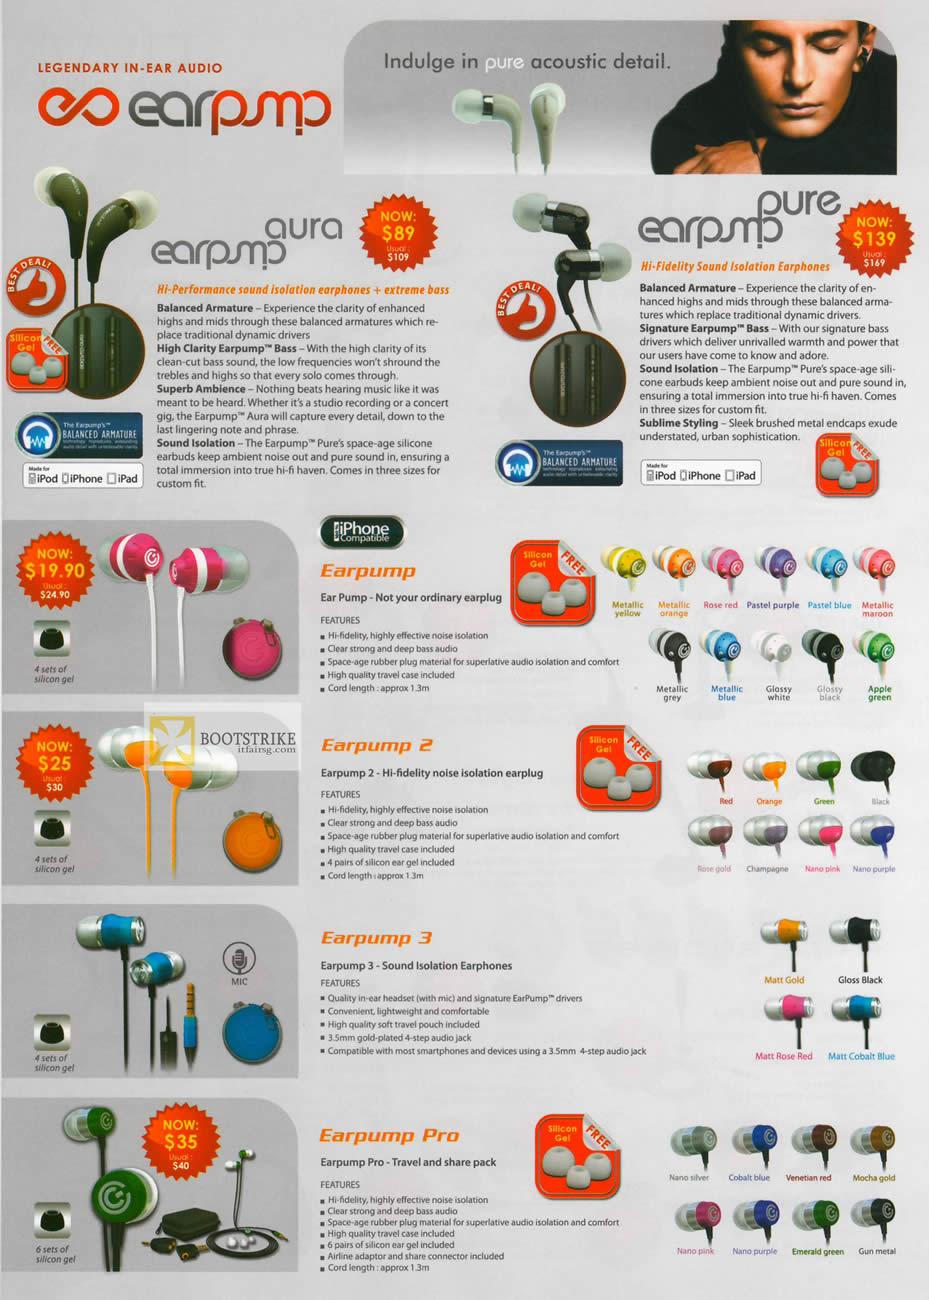 IT SHOW 2012 price list image brochure of Leap Frog Sonicgear Pure Earphones, Earpump 2, 3, Pro